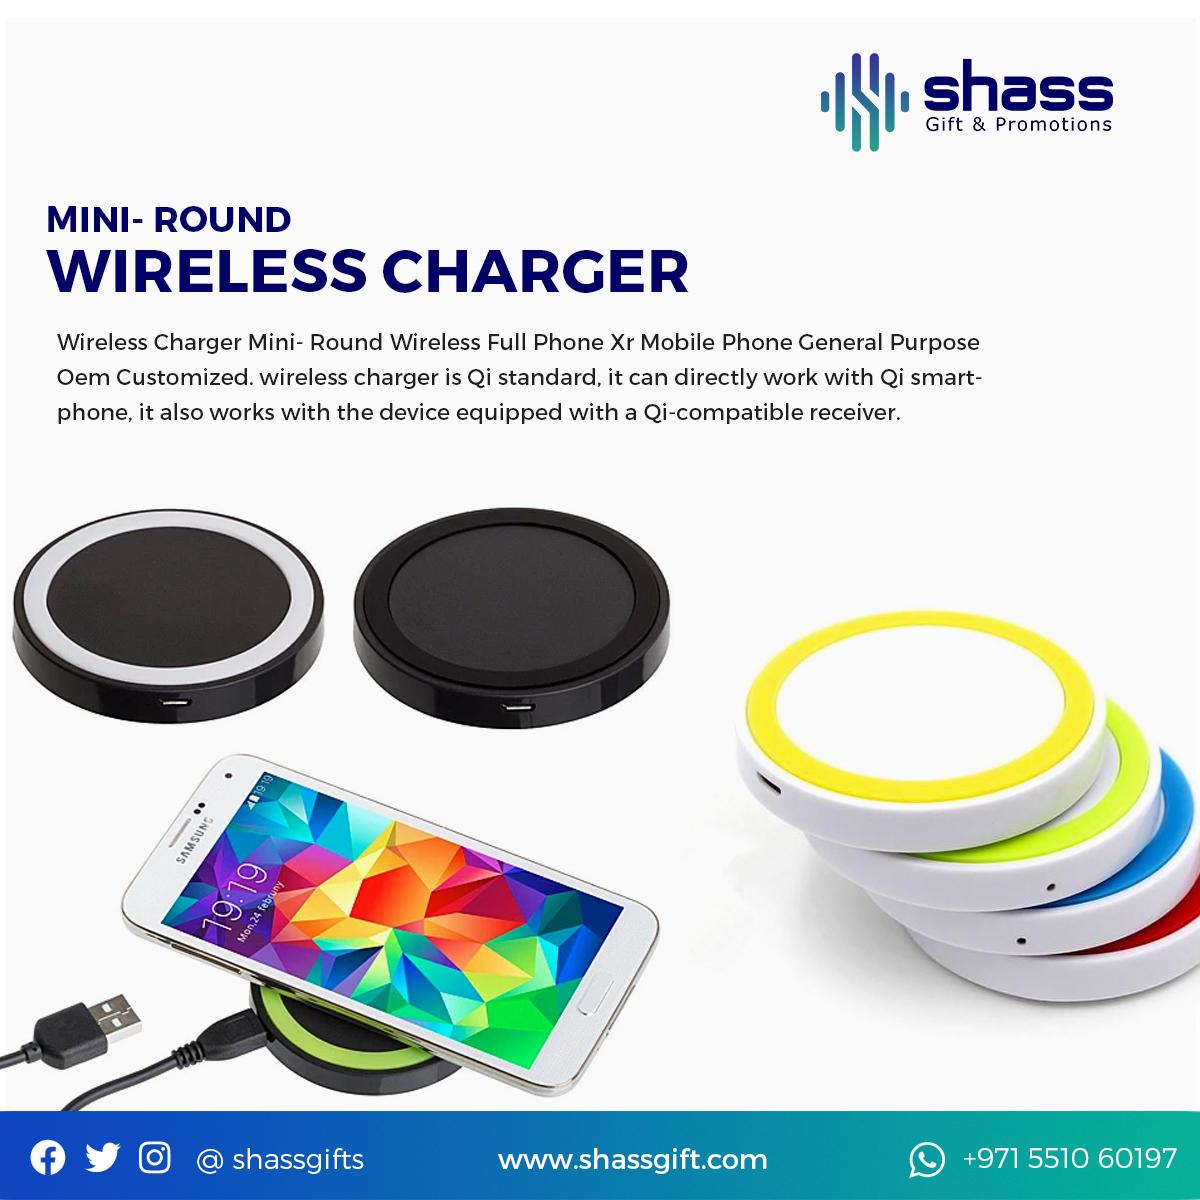 Mini Round Wireless Charger